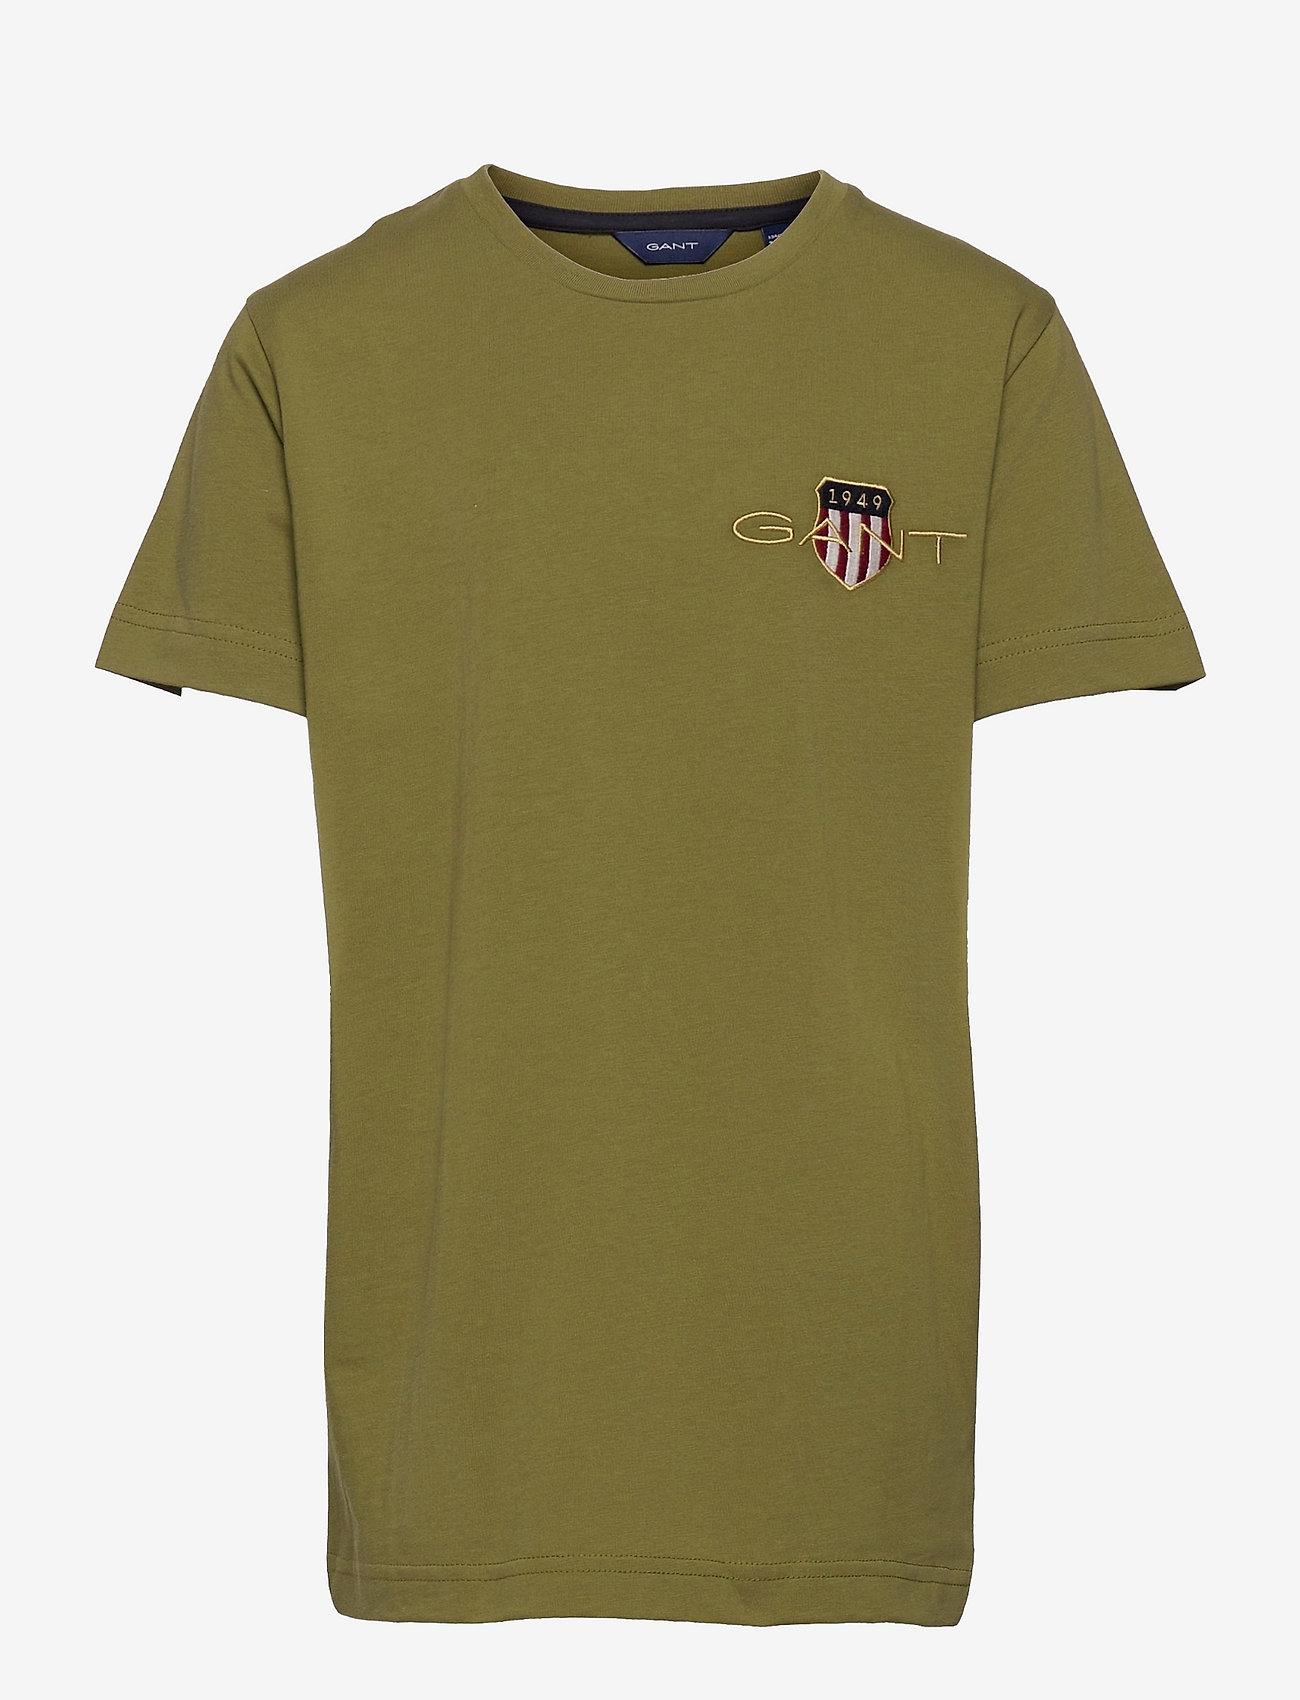 GANT - ARCHIVE SHIELD EMB SS T-SHIRT - short-sleeved - olive branch green - 0